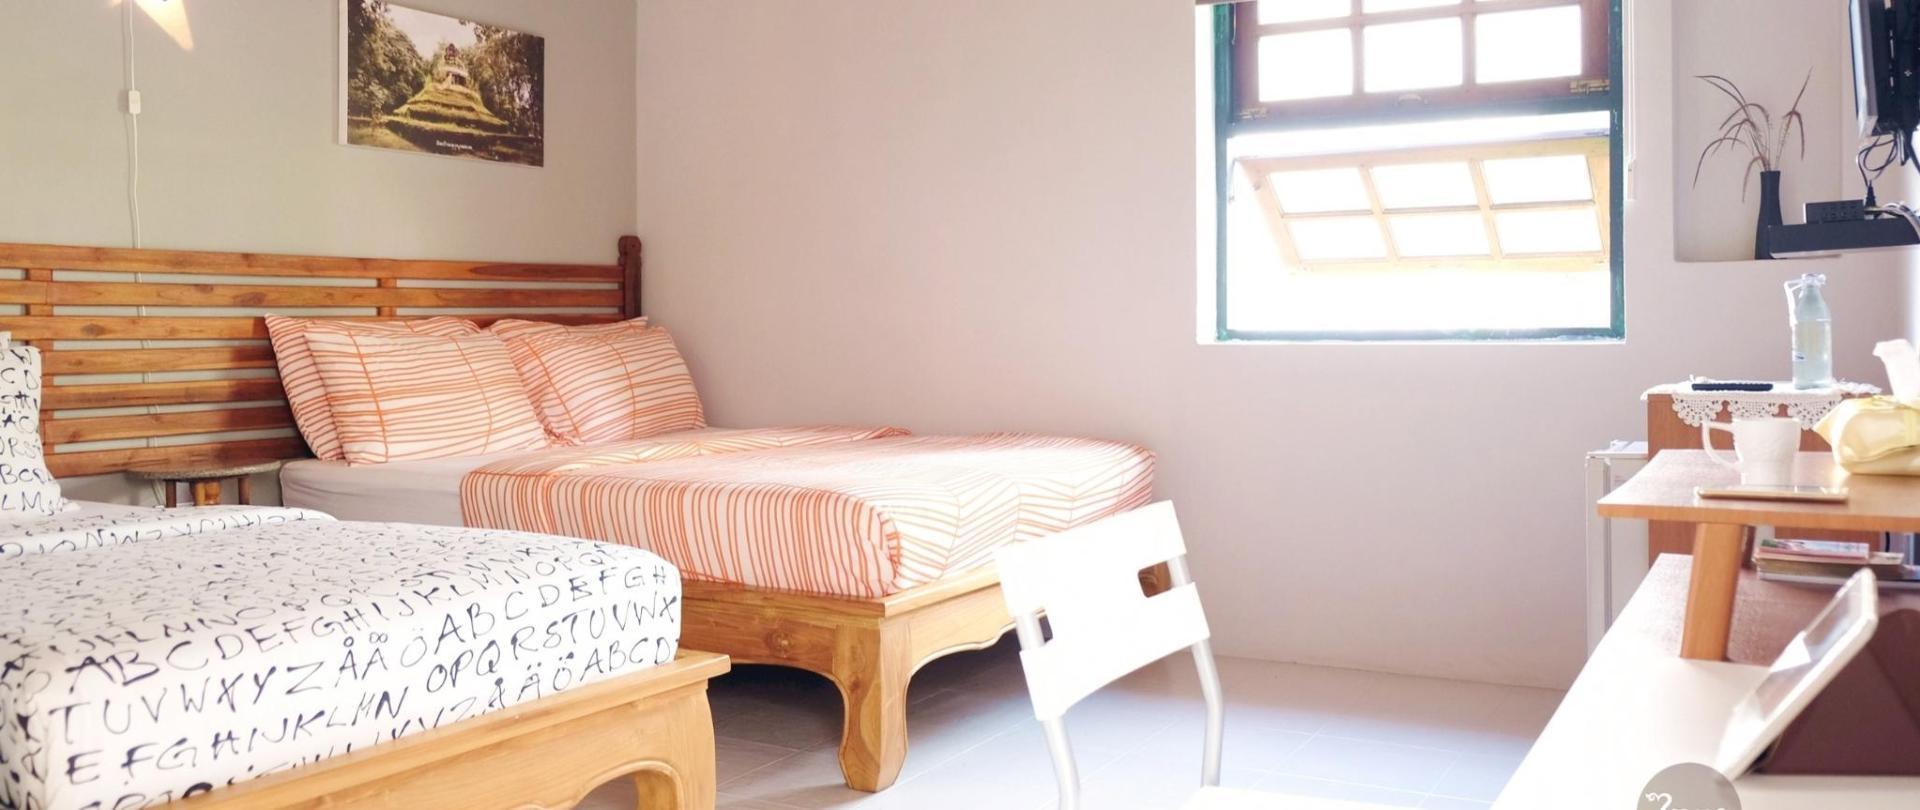 Bedroom Decorative detail